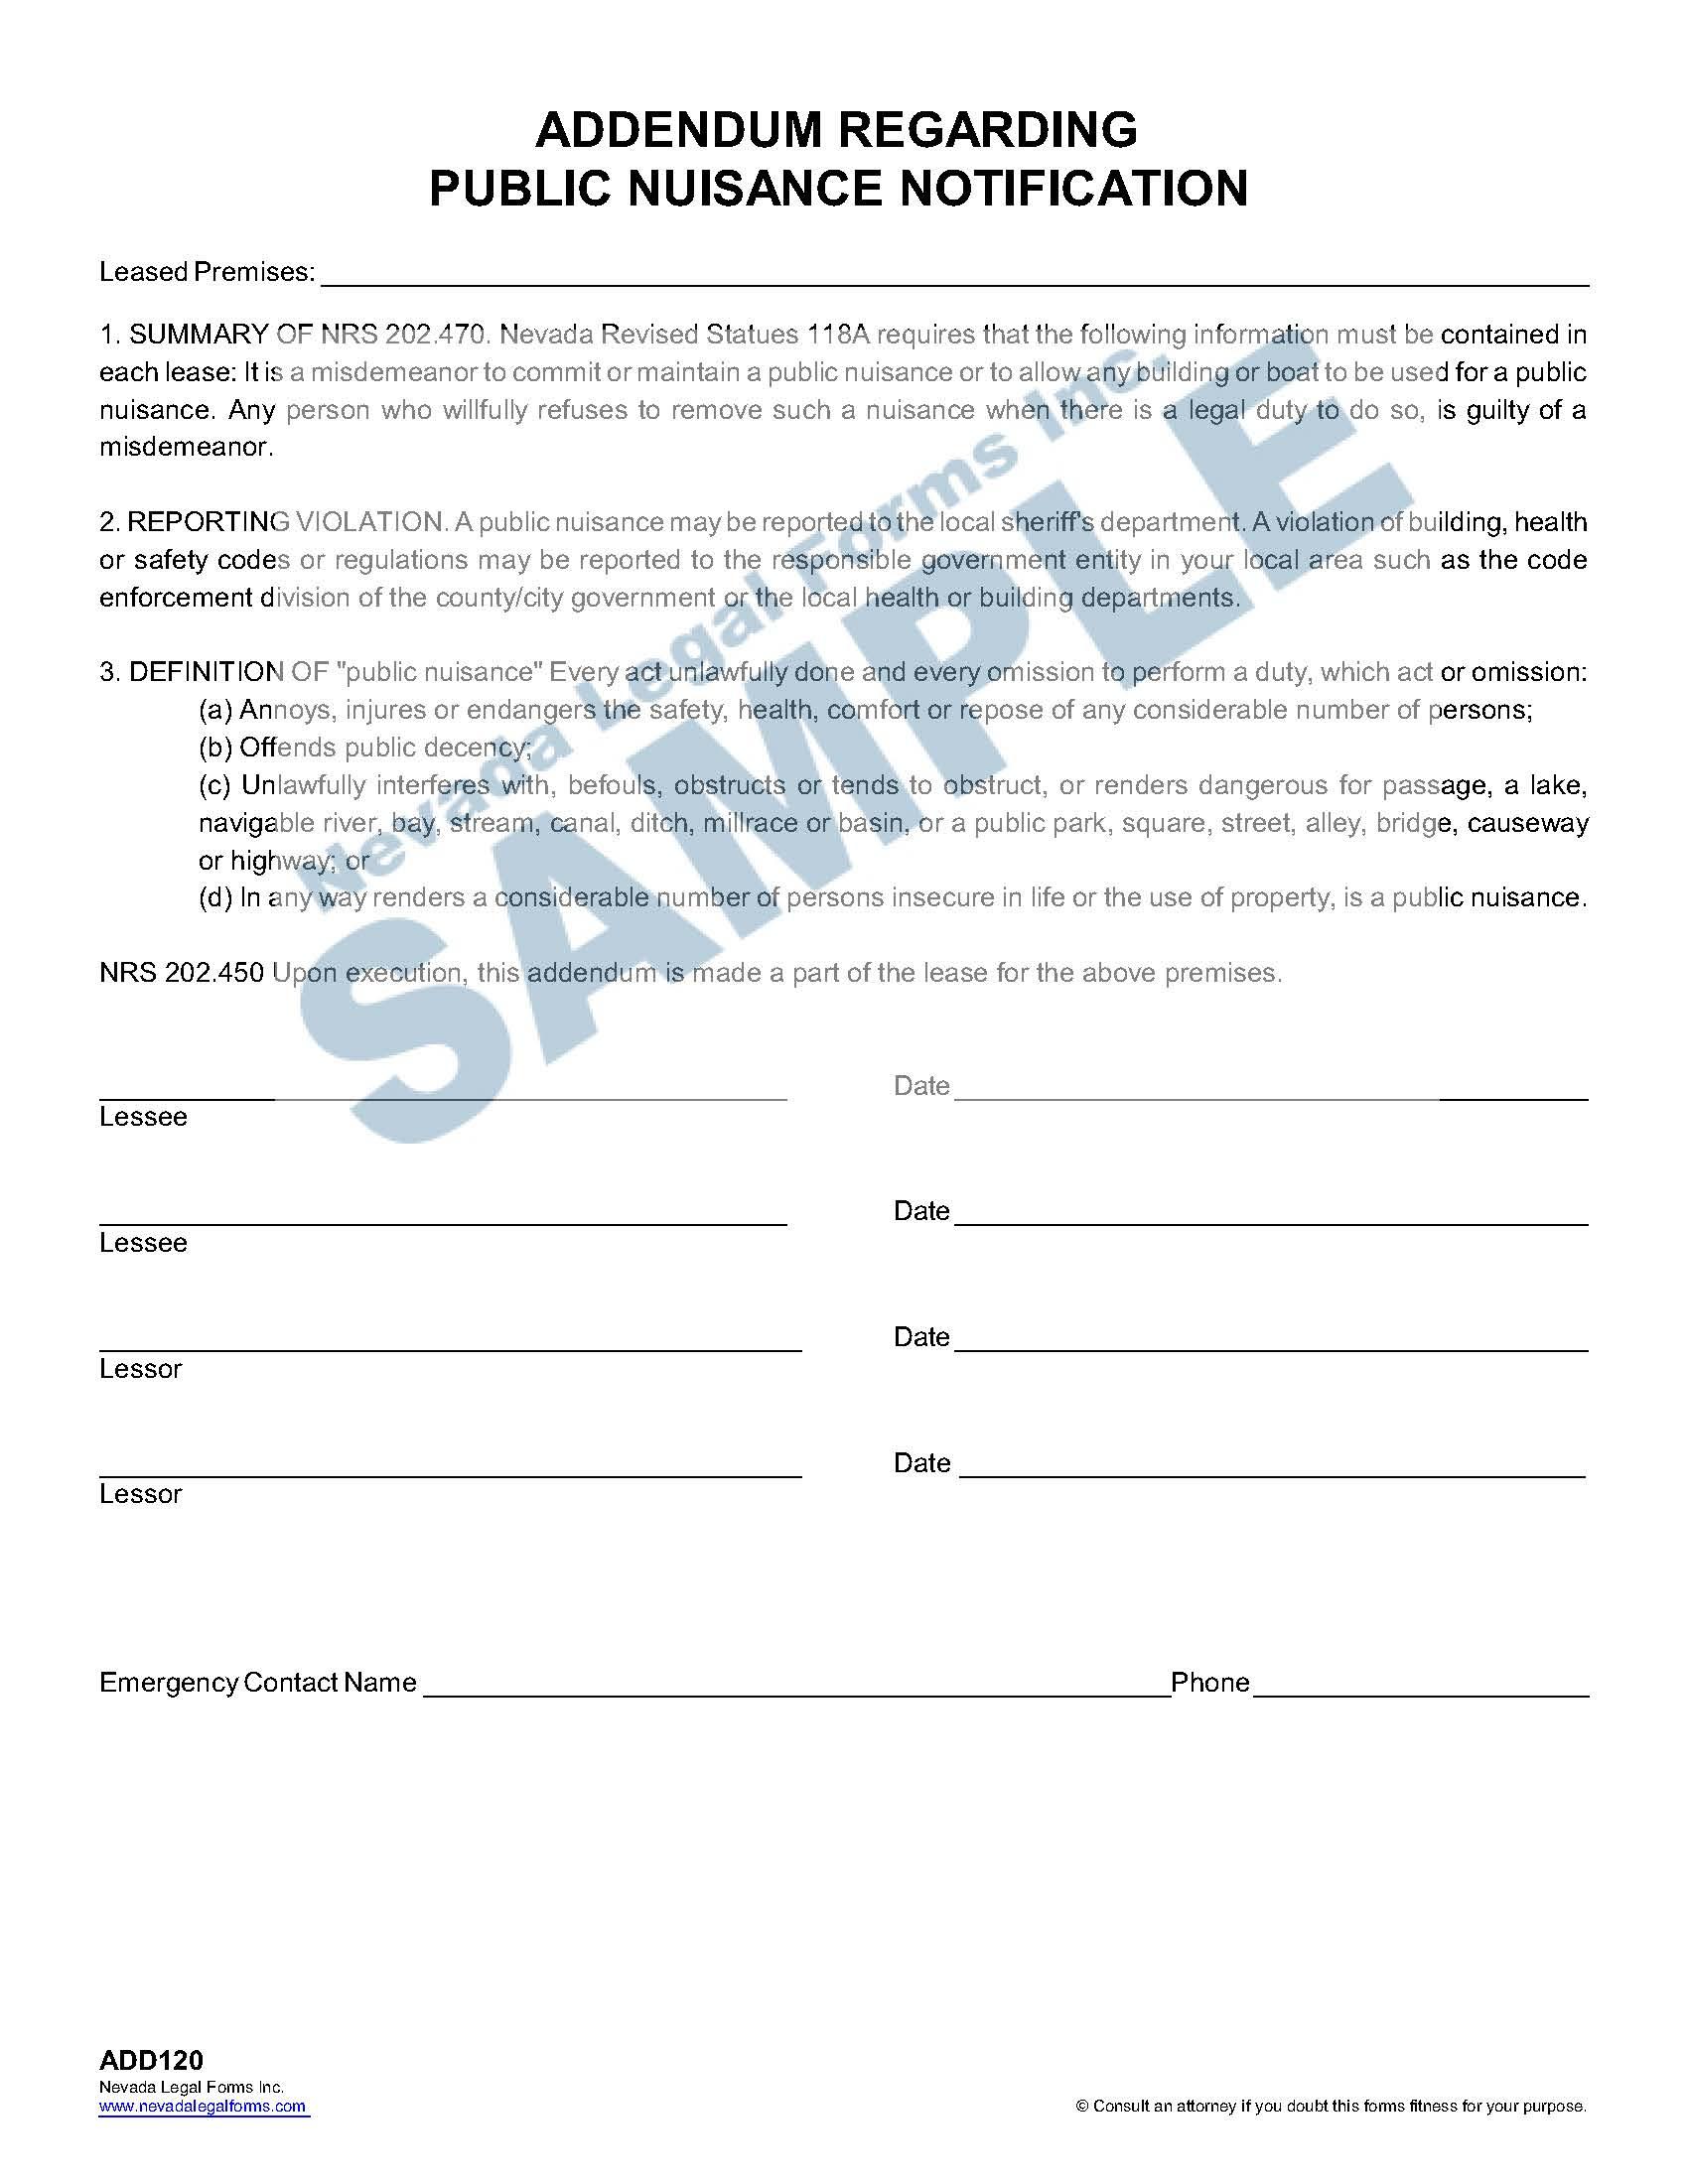 Addendum Regarding Public Nuisance Notification